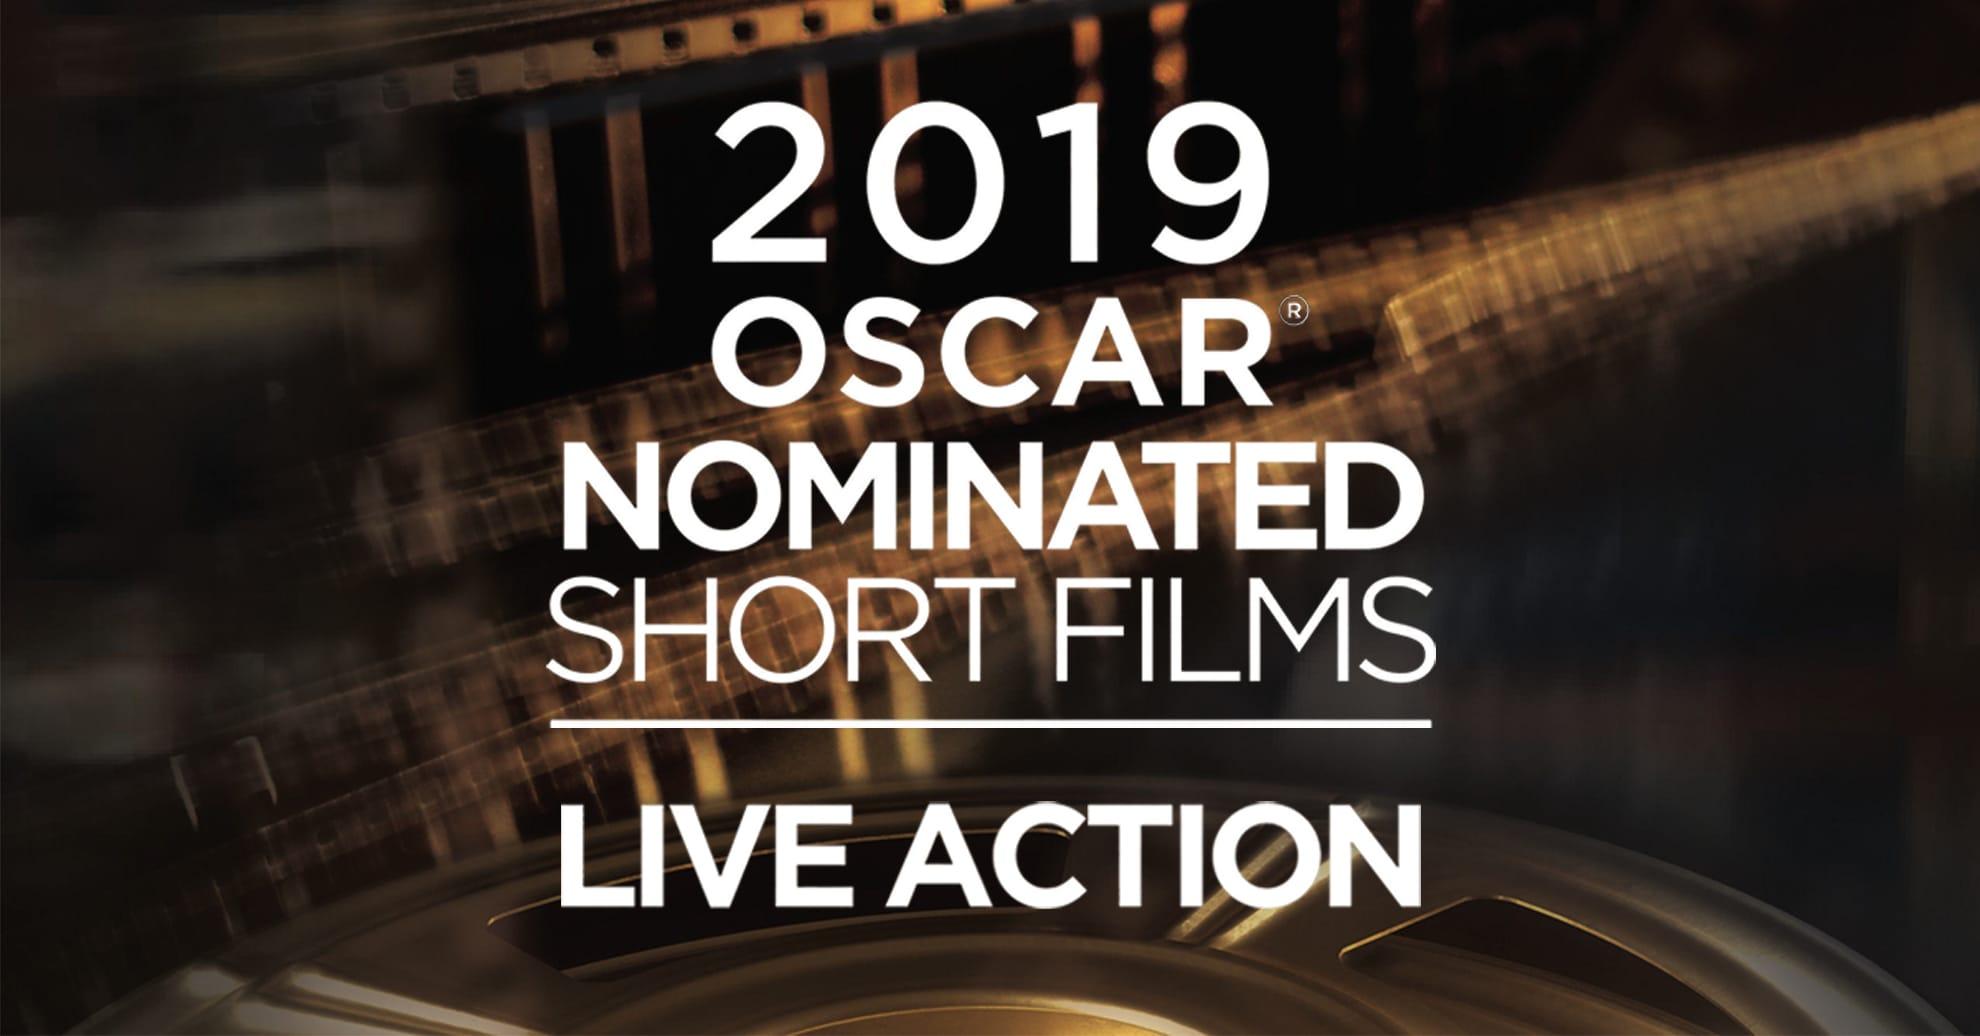 Wednesday 20.02.19 – 8pm: 2019 Oscar Nominated Short Films | LIVE ACTION